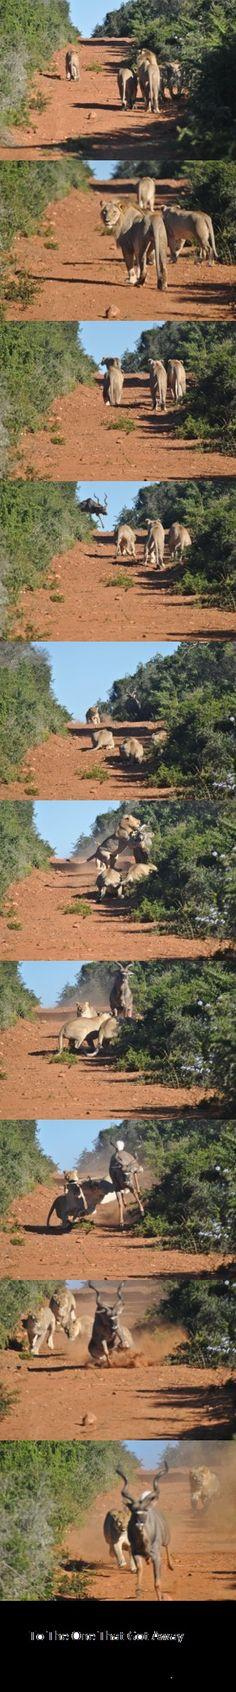 That's how you do it. Great Stuff  #Elephants #Lions #Giraffe #Leopards #Crocodiles #Zebras #Deer #Buffalo #Bison #Bears #Caribou #Wolves #Whales #Seals #Sharks #Polar Bears #Rhinoceros #Hippopotamus